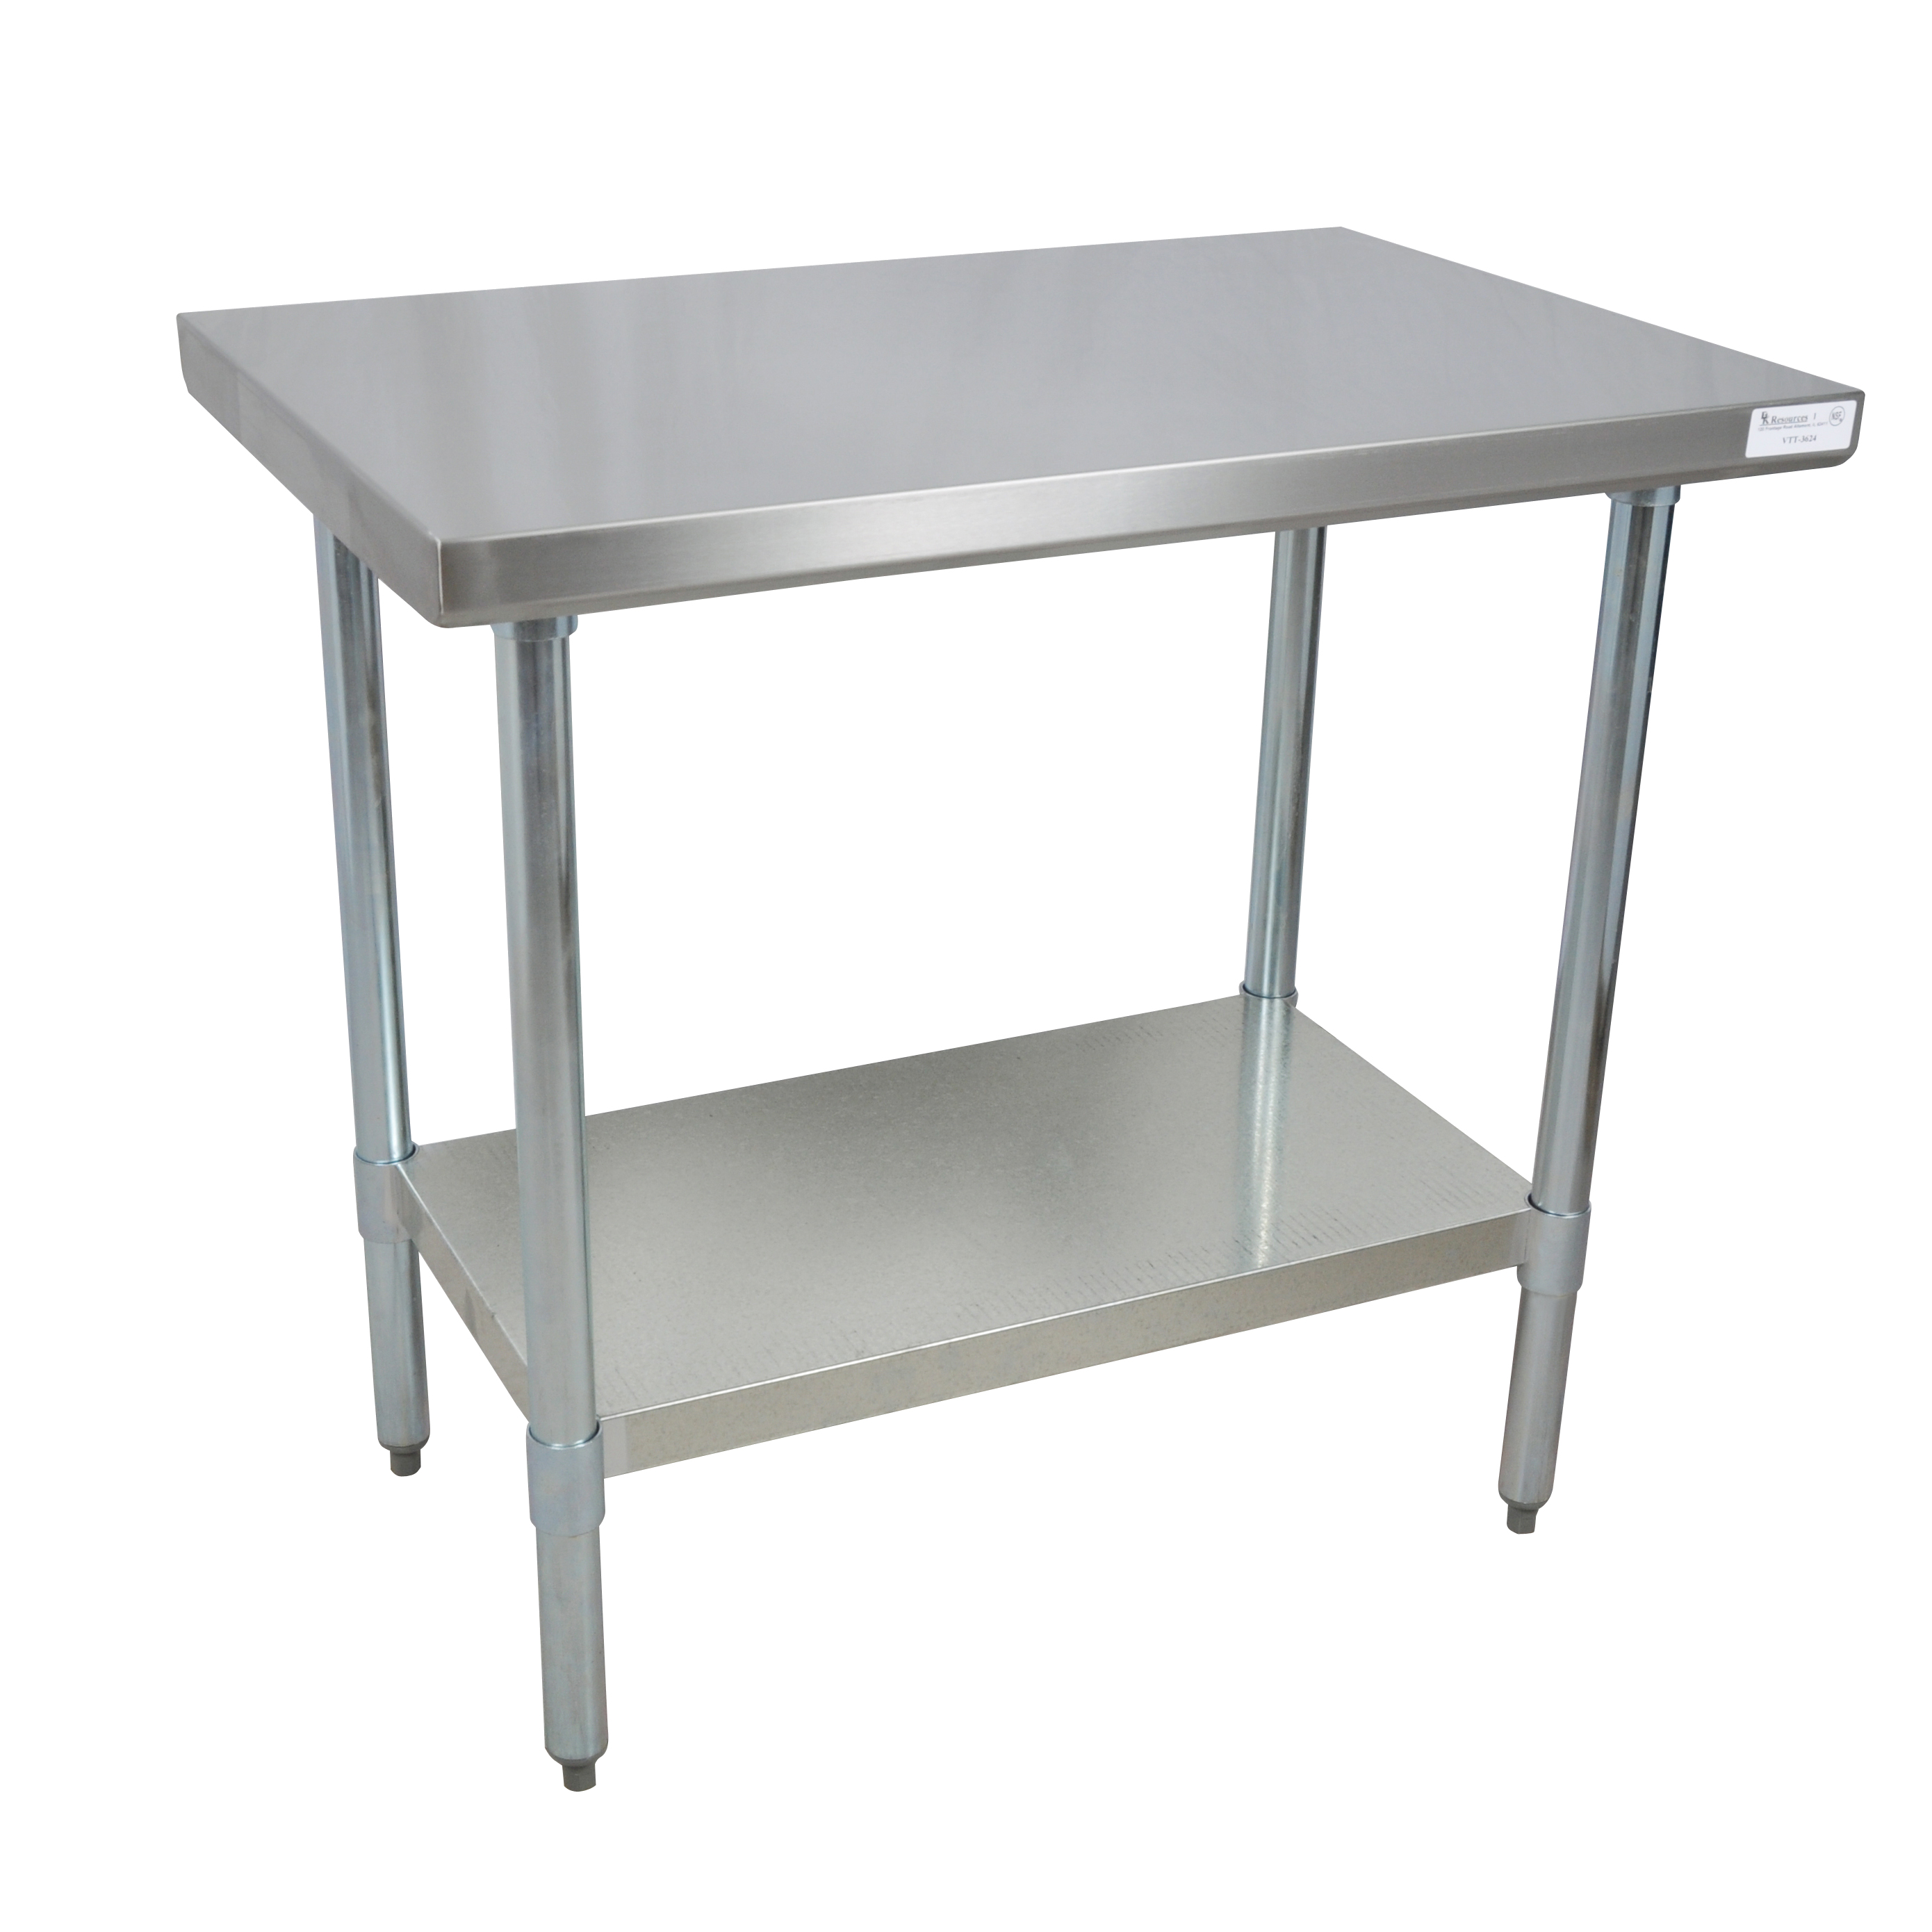 BK Resources CVT-4836 work table,  40